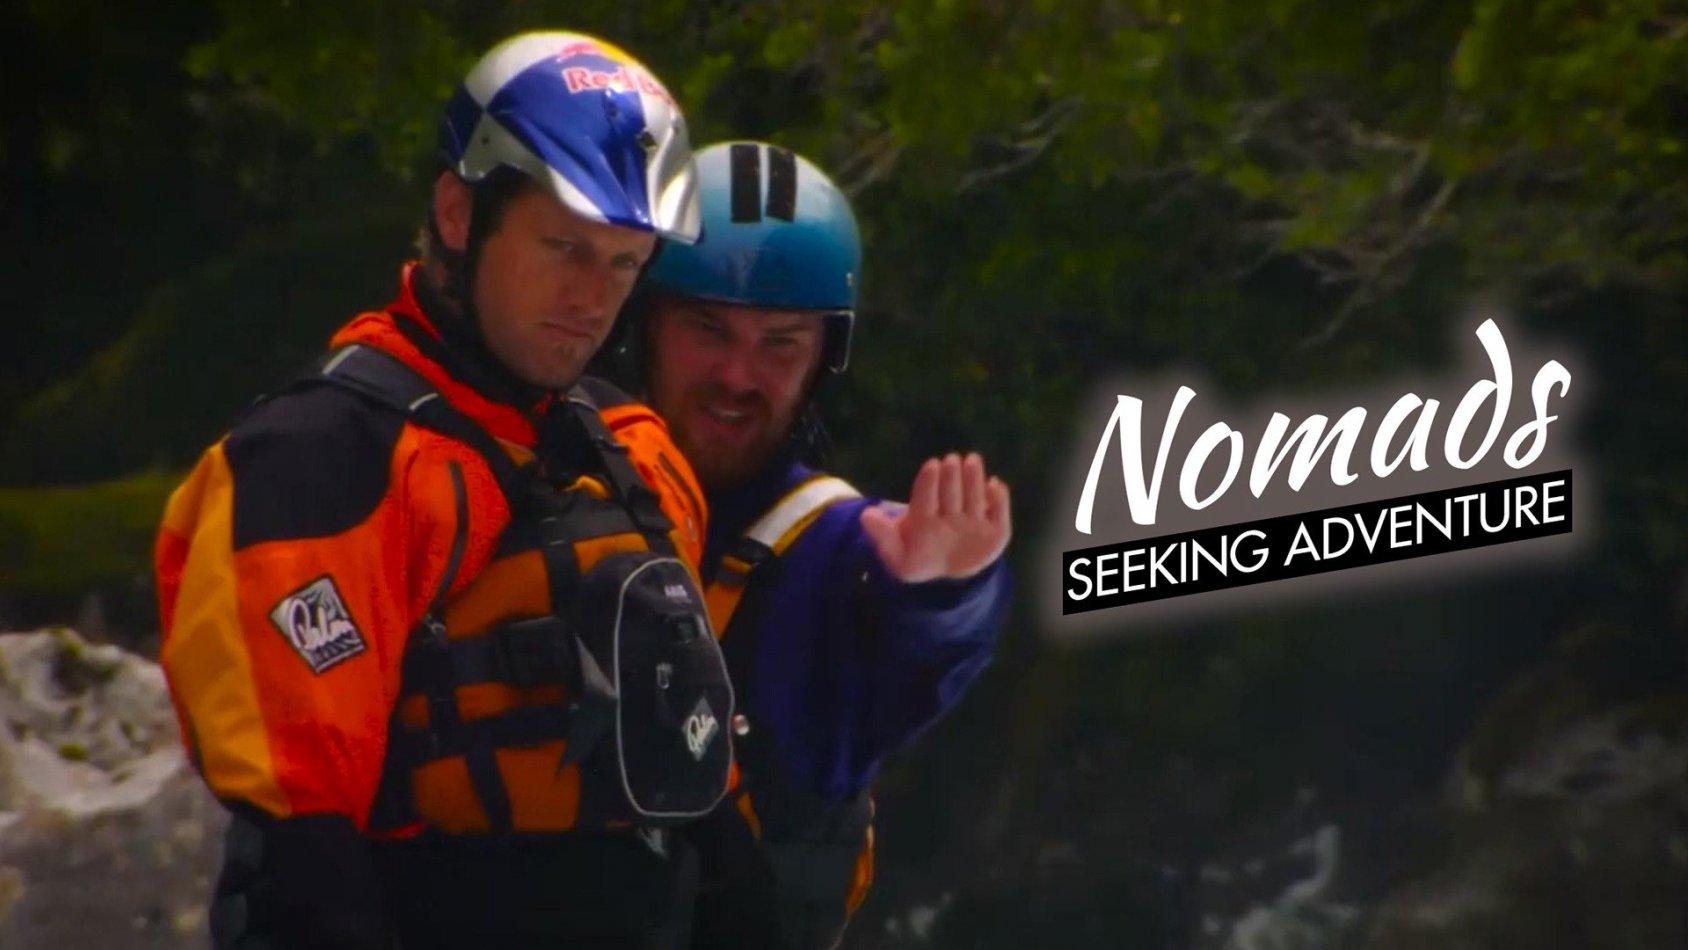 Nomads Seeking Adventure